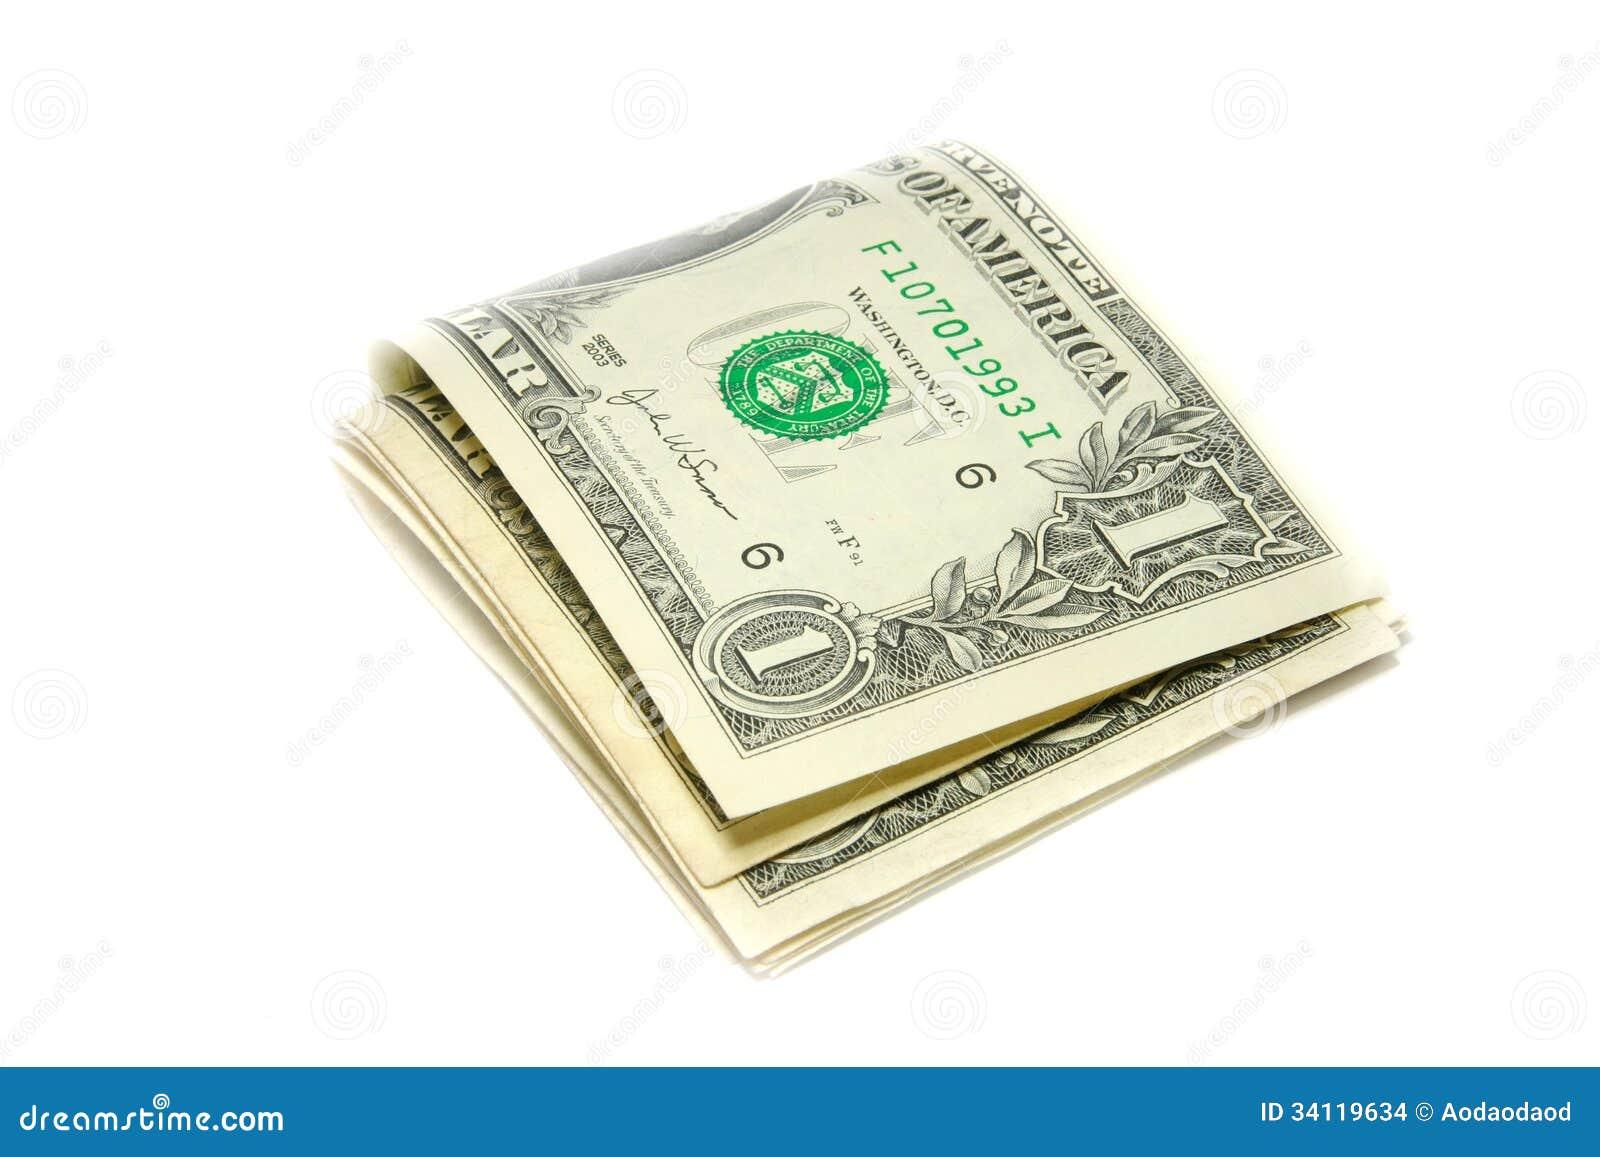 What 4000 in 100 Dollar Bills looks like